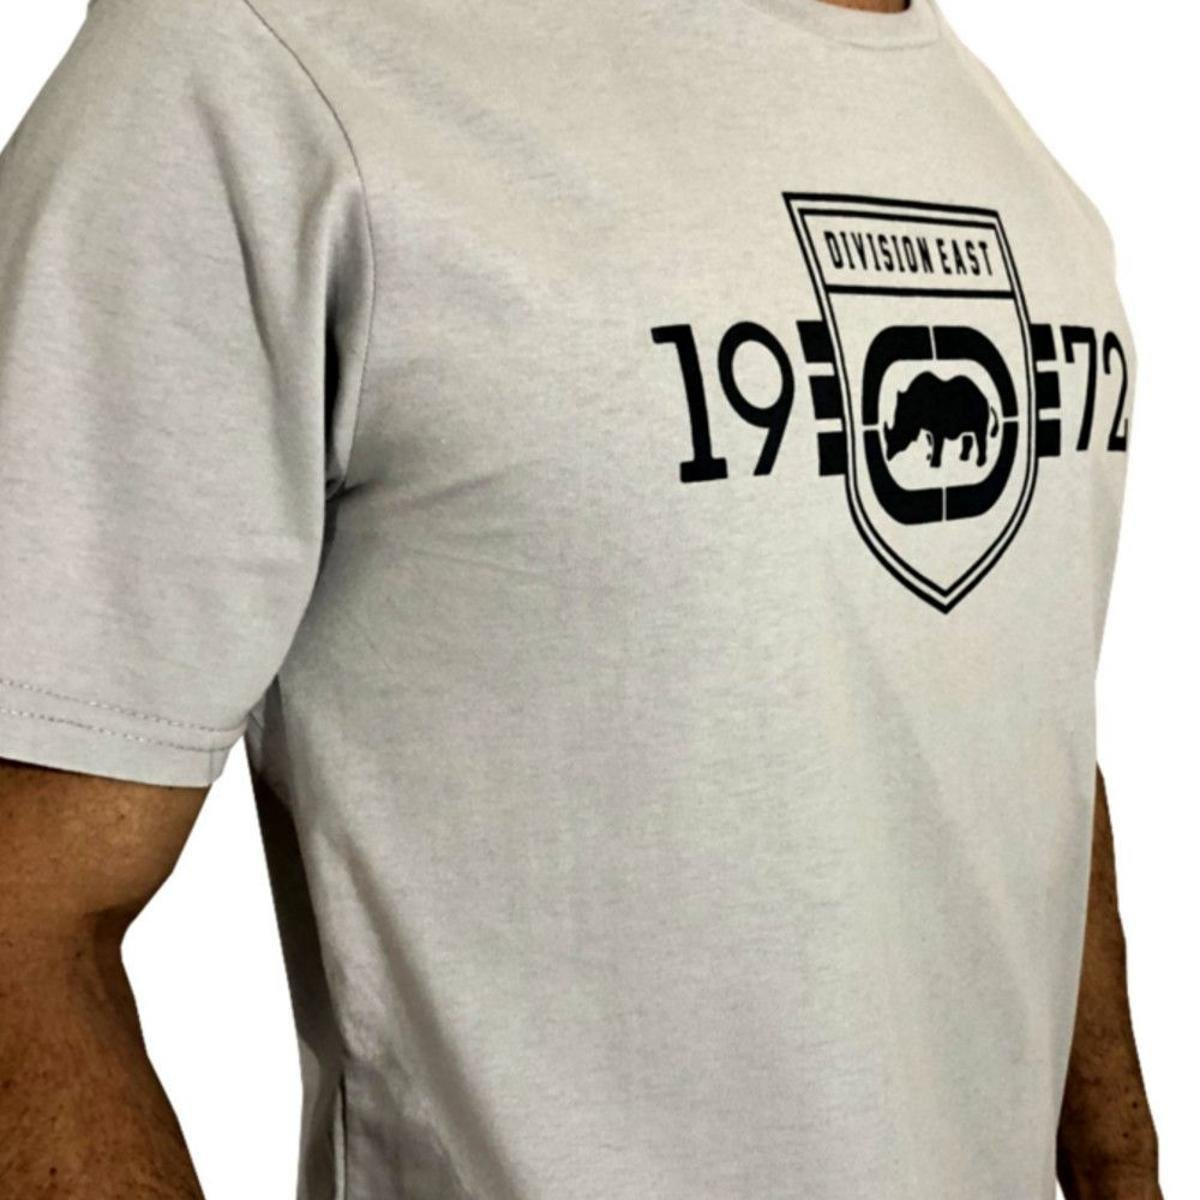 Camiseta Ecko Division East Masculina - Cinza